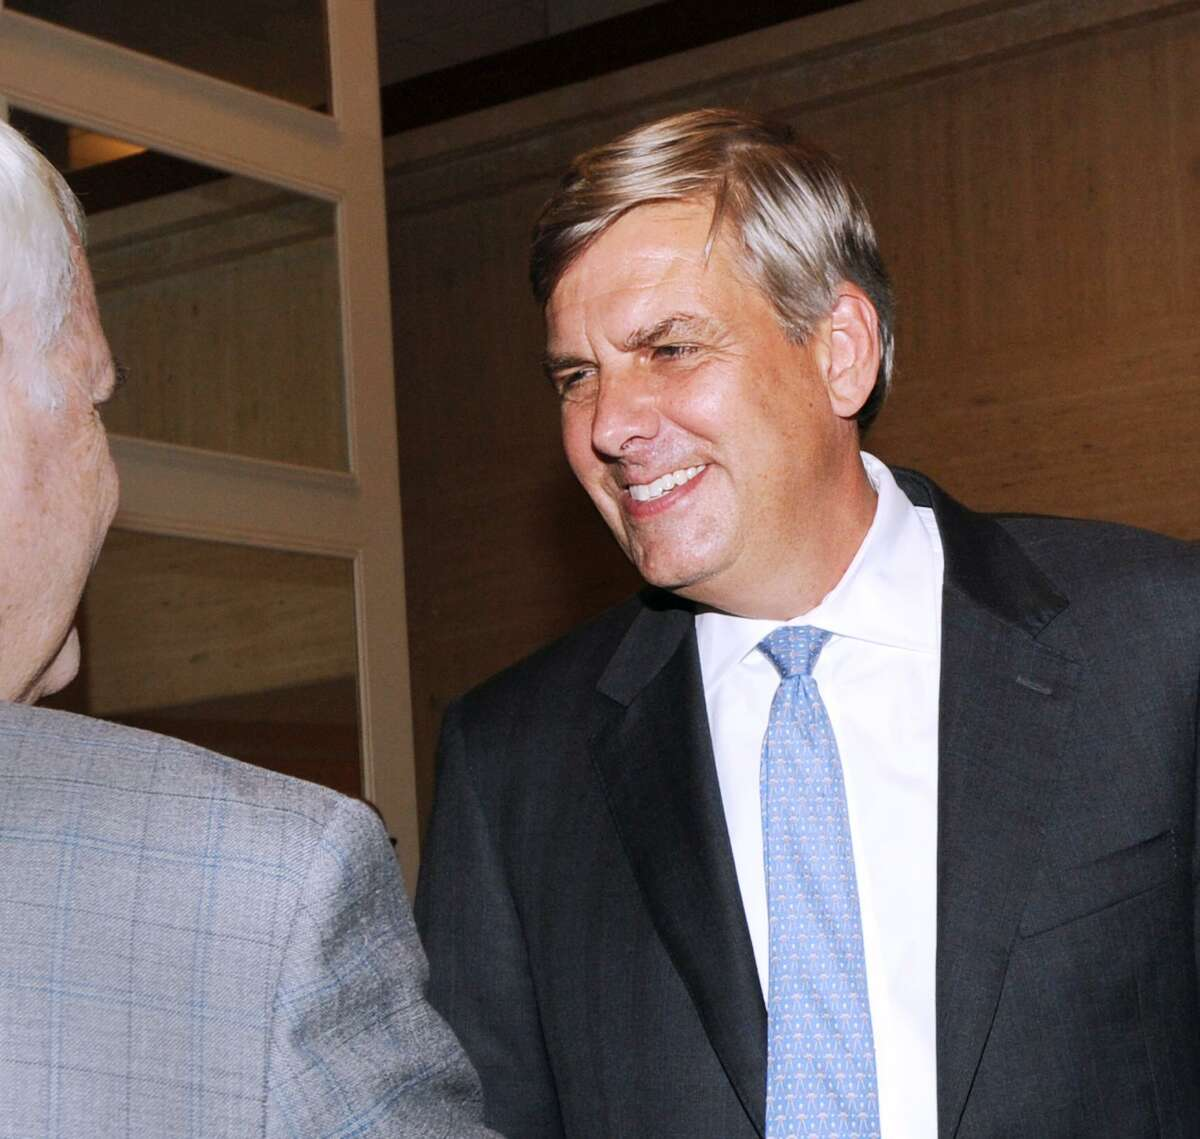 Republican gubernatorial nominee Bob Stefanowski during the State Republicans annual Prescott Bush Awards Dinner at the Stamford Marriott Hotel & Spa, Conn., Thursday, Sept. 27, 2018.